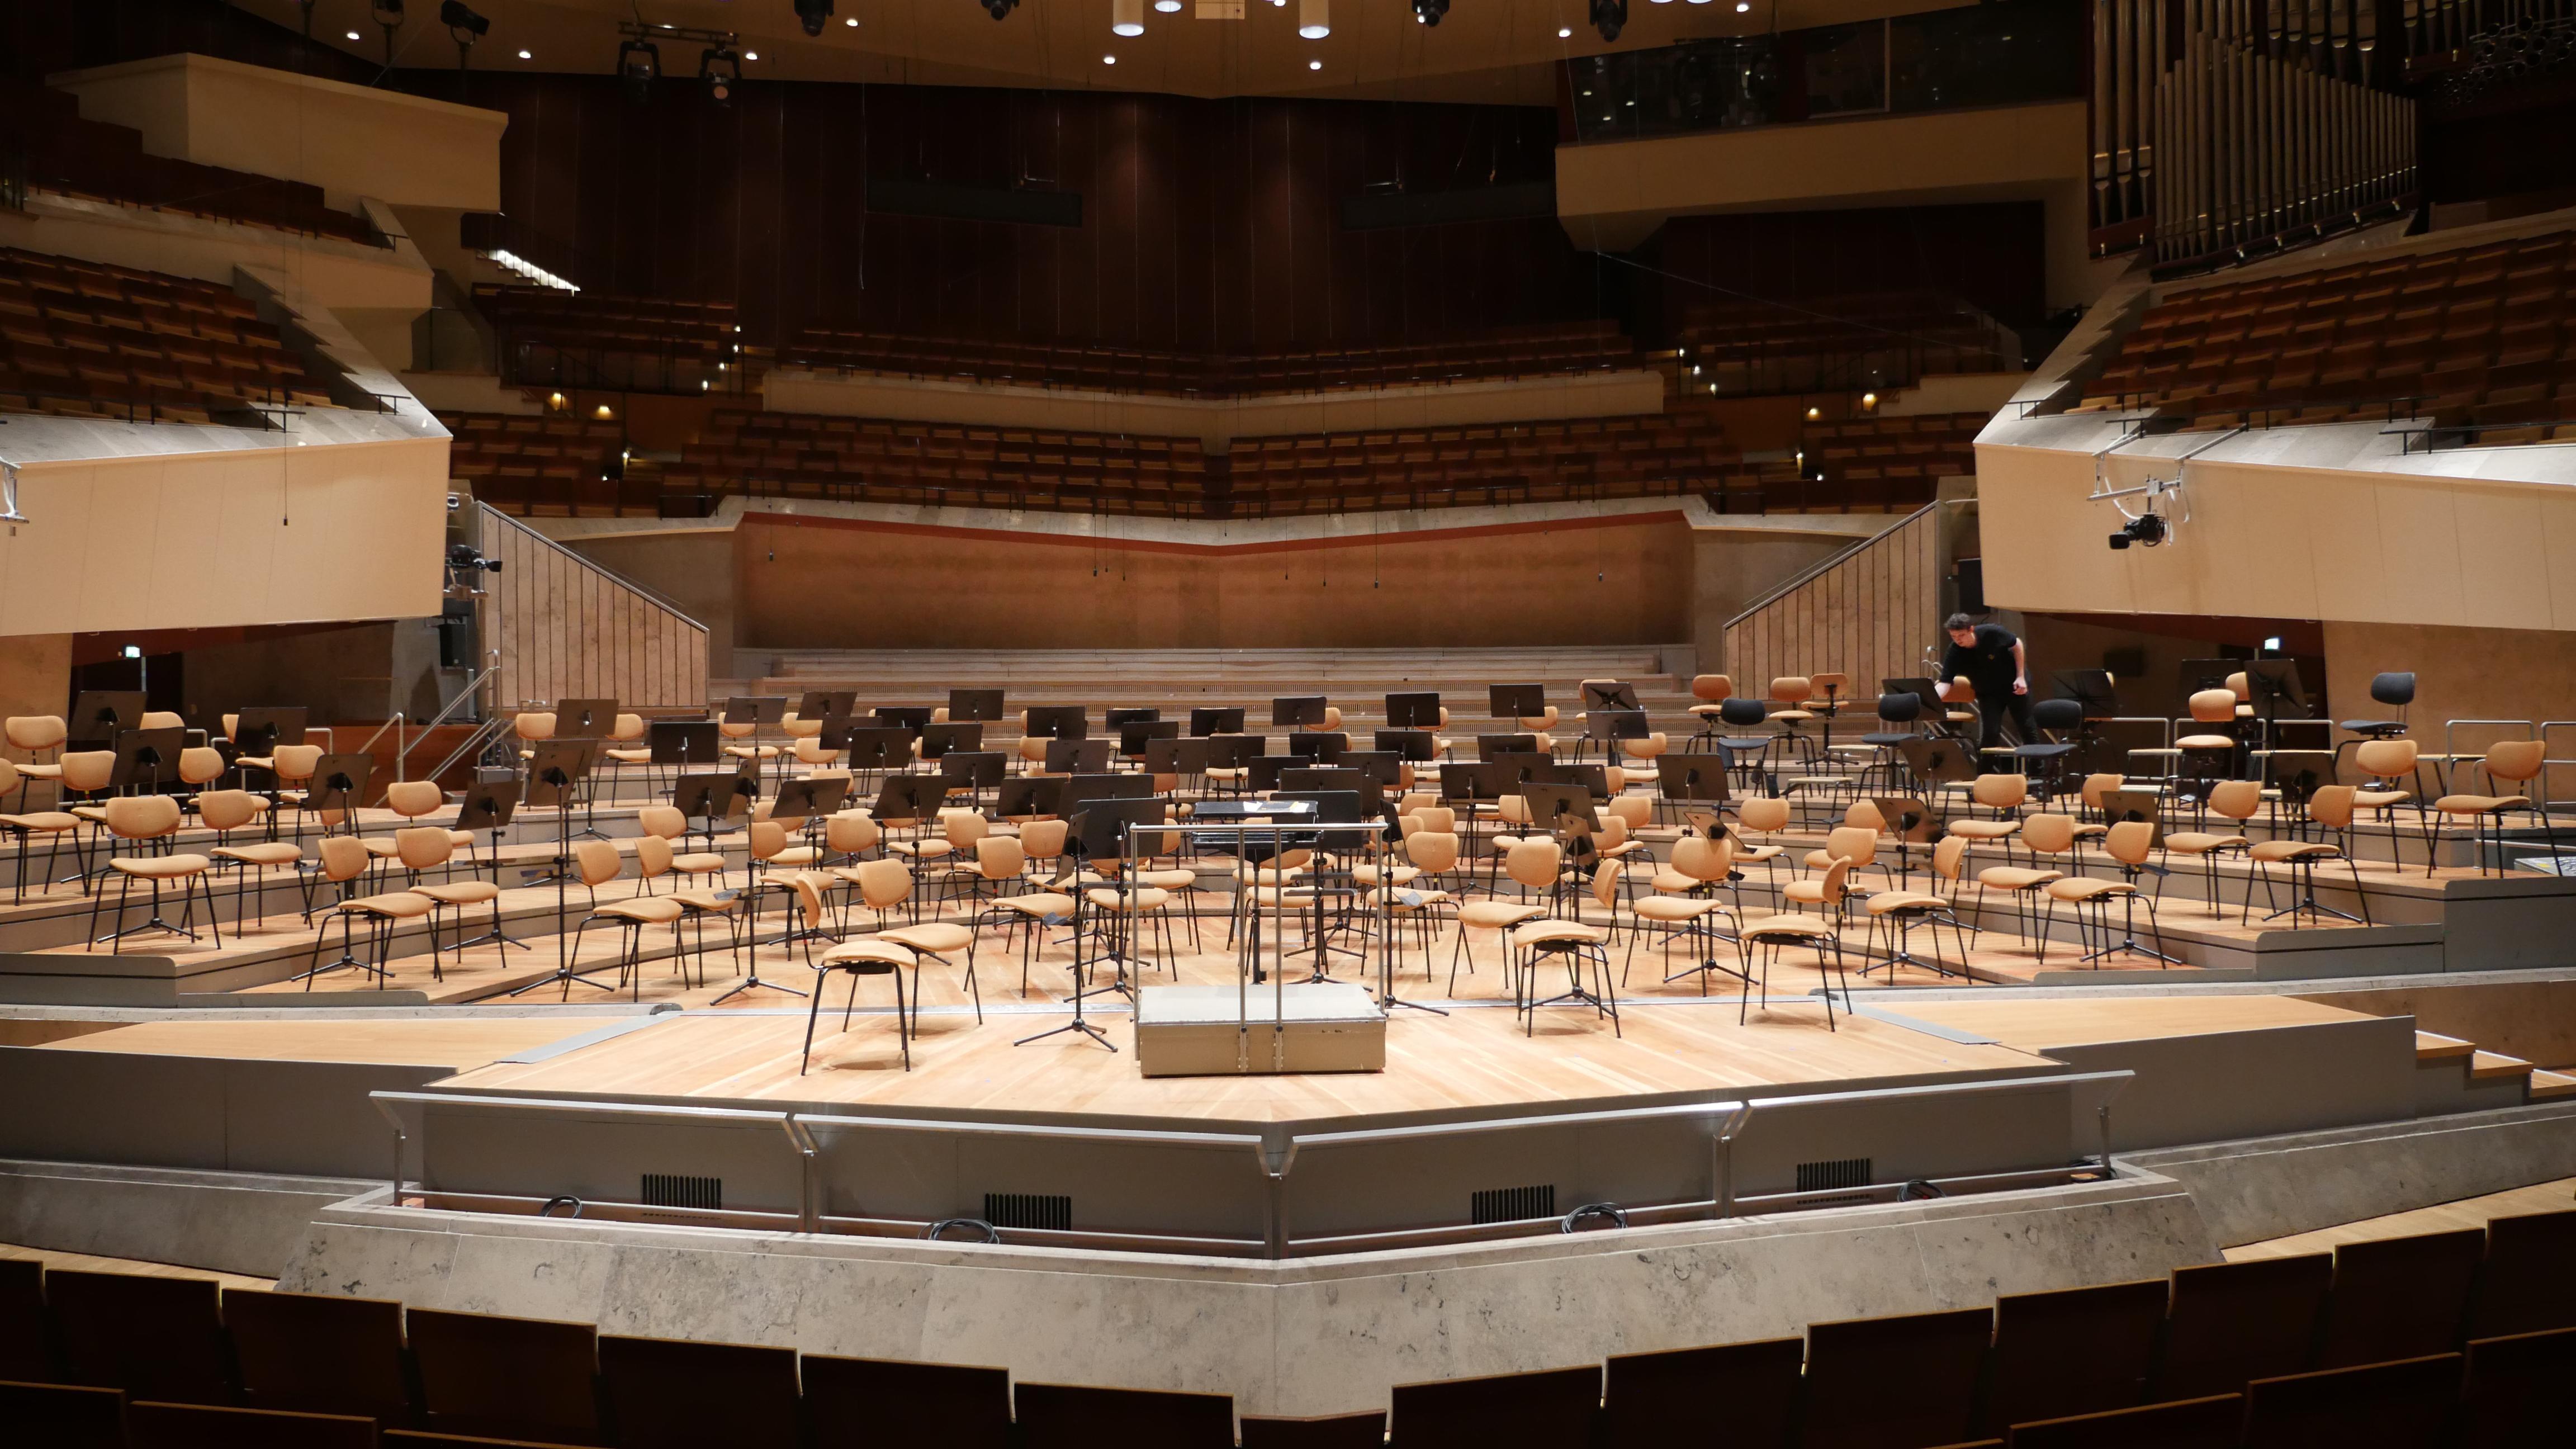 photo: Berlin Philharmonic Concert Hall